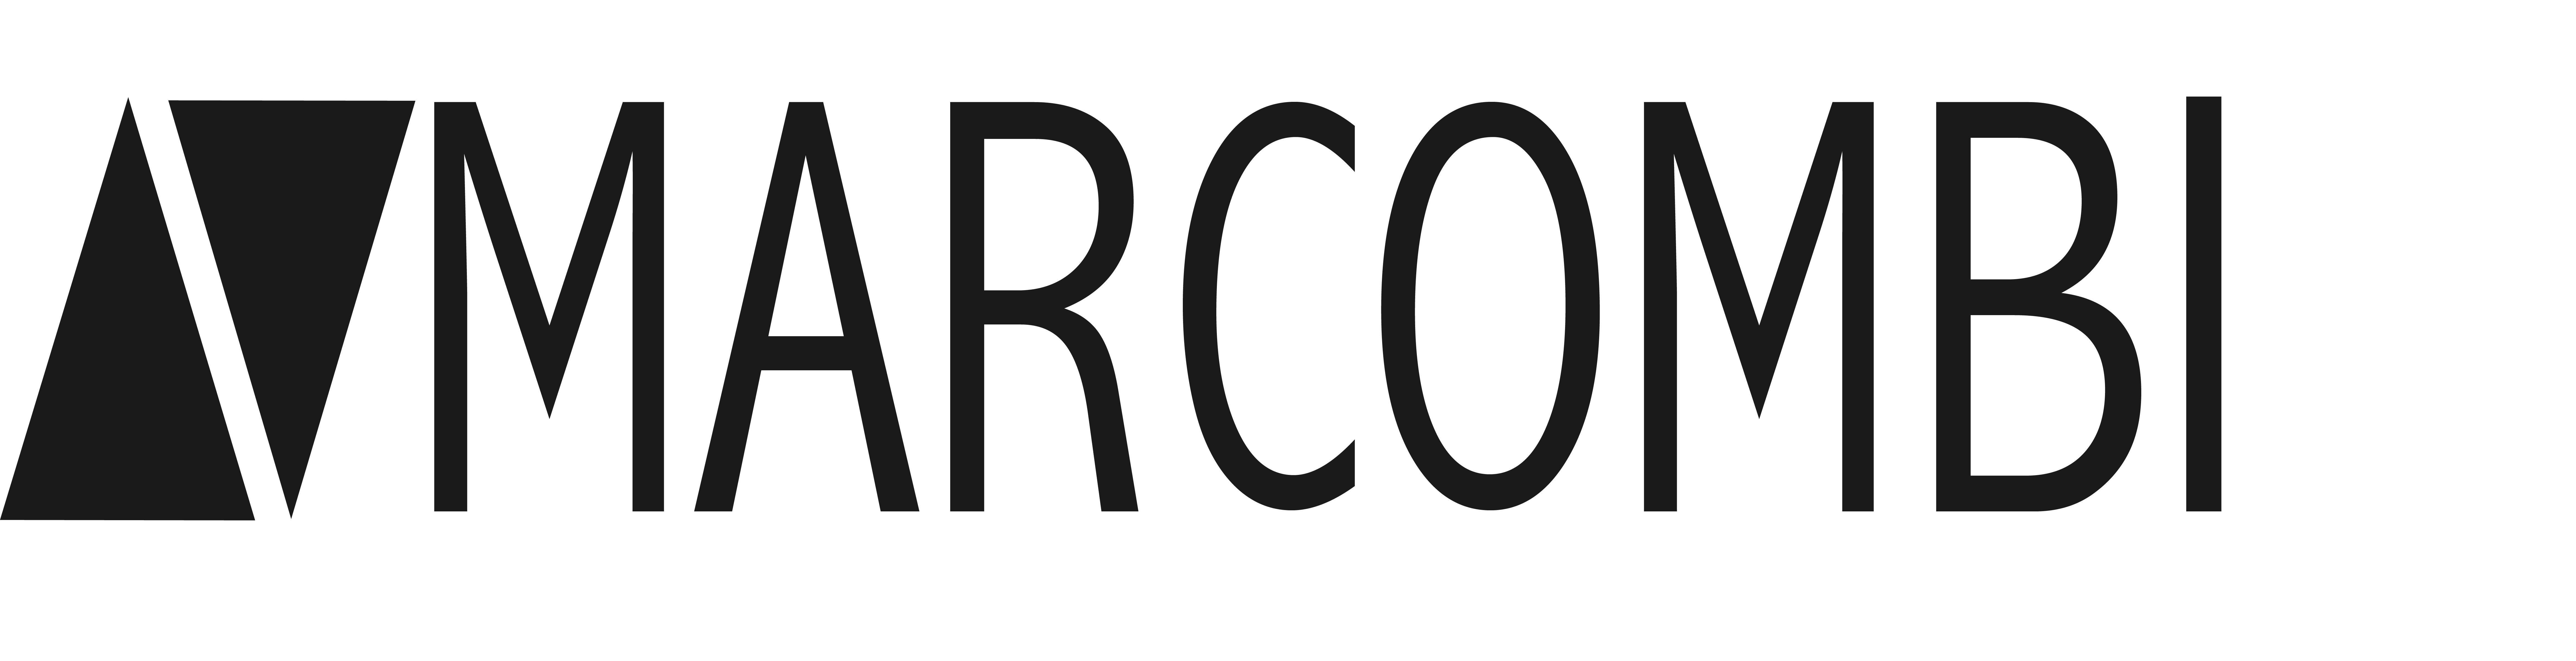 Marcombi